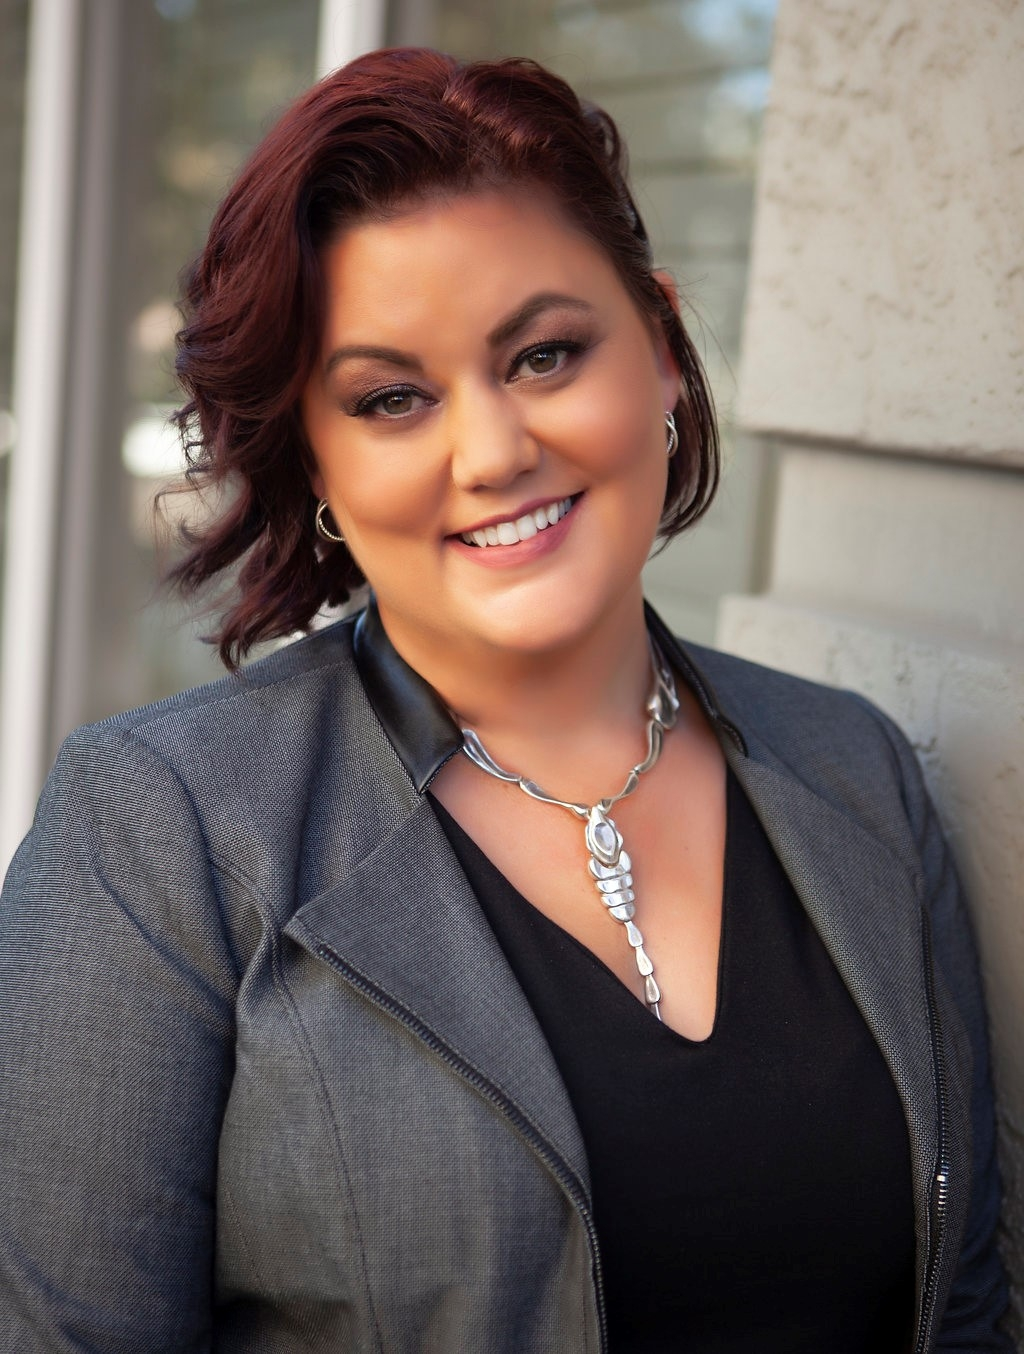 Melanie Stover